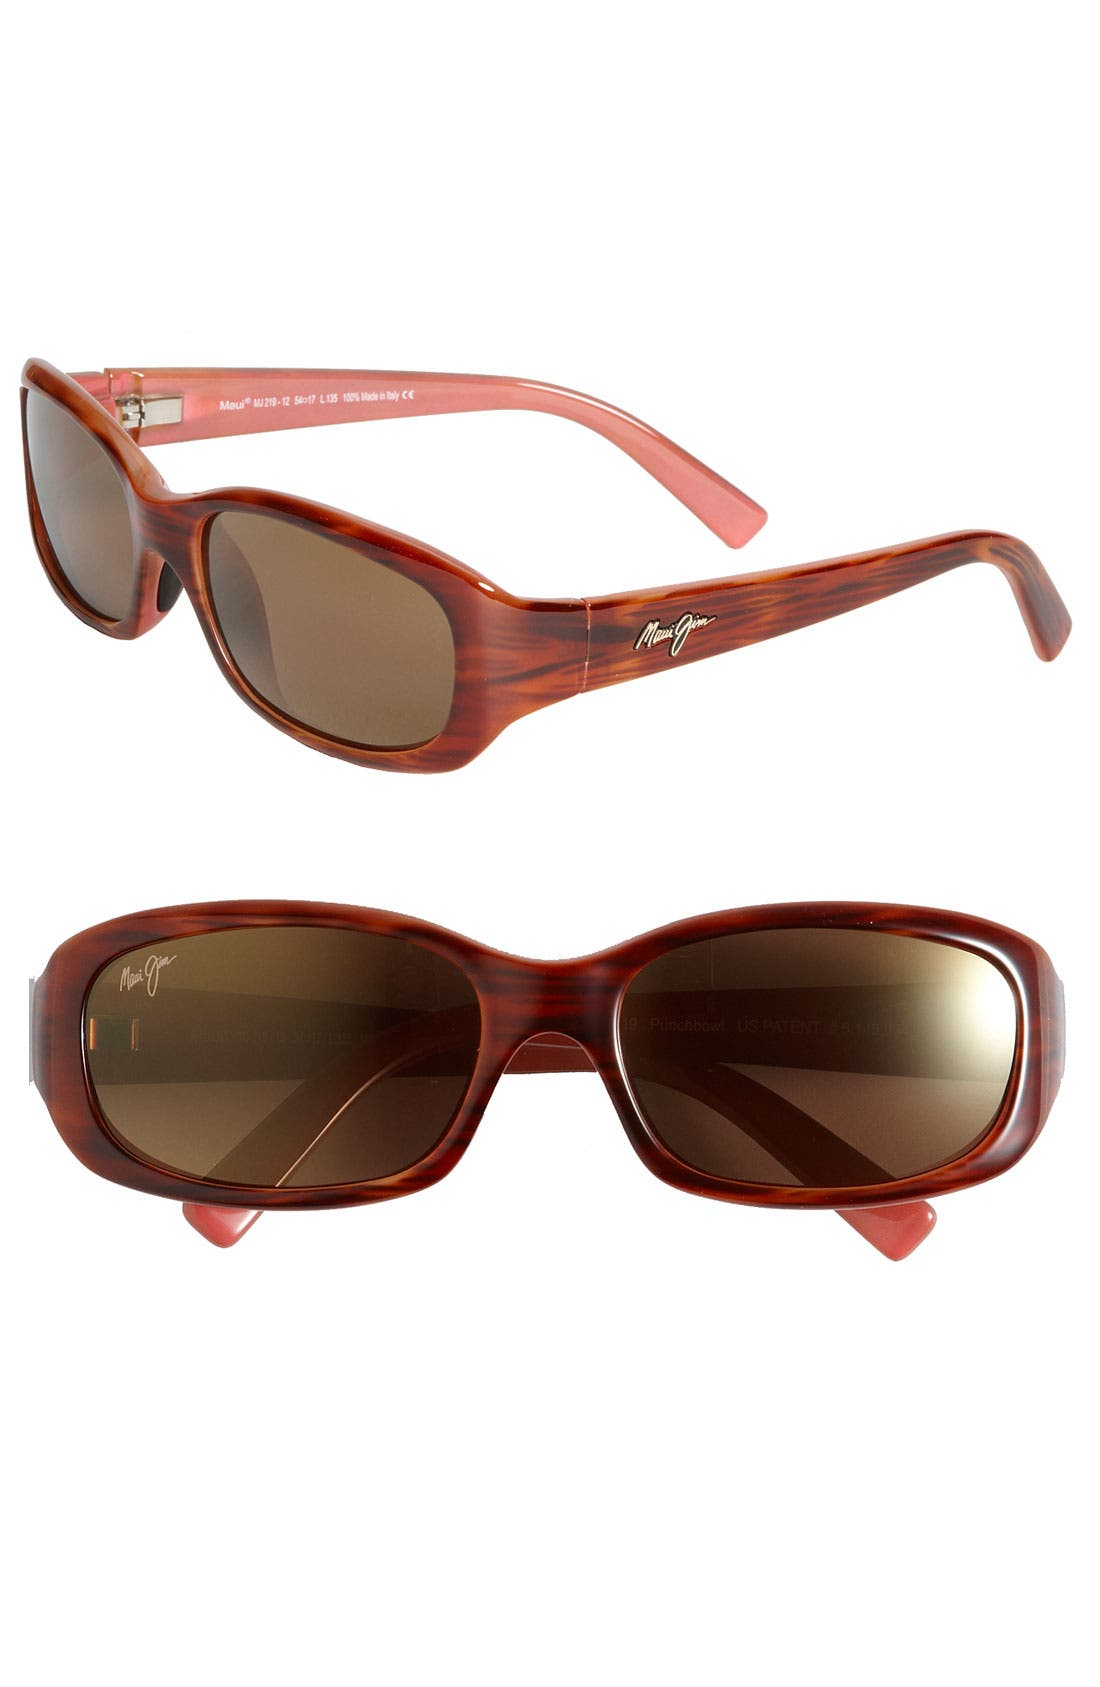 Main Image - Maui Jim Punchbowl 54mm PolarizedPlus2® Rectangular Sunglasses